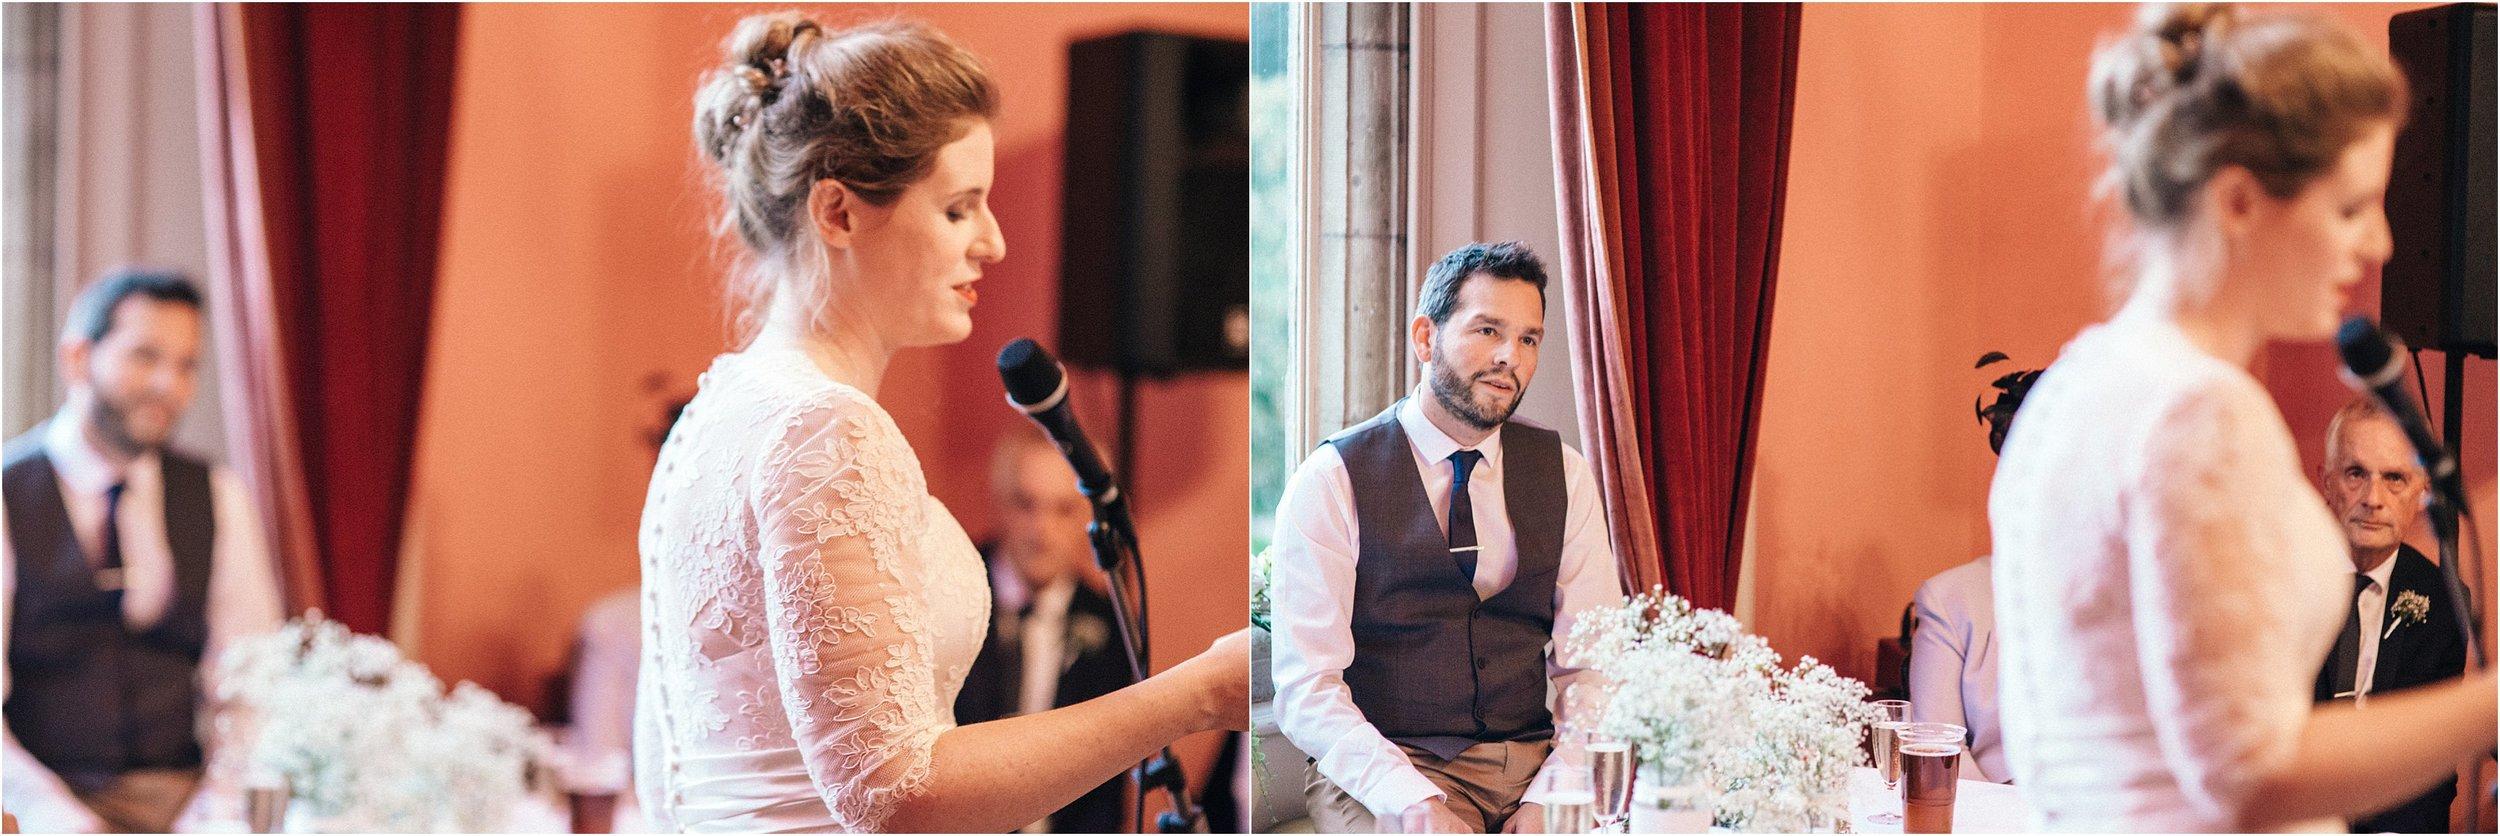 Northcourt House Wedding_0056.jpg